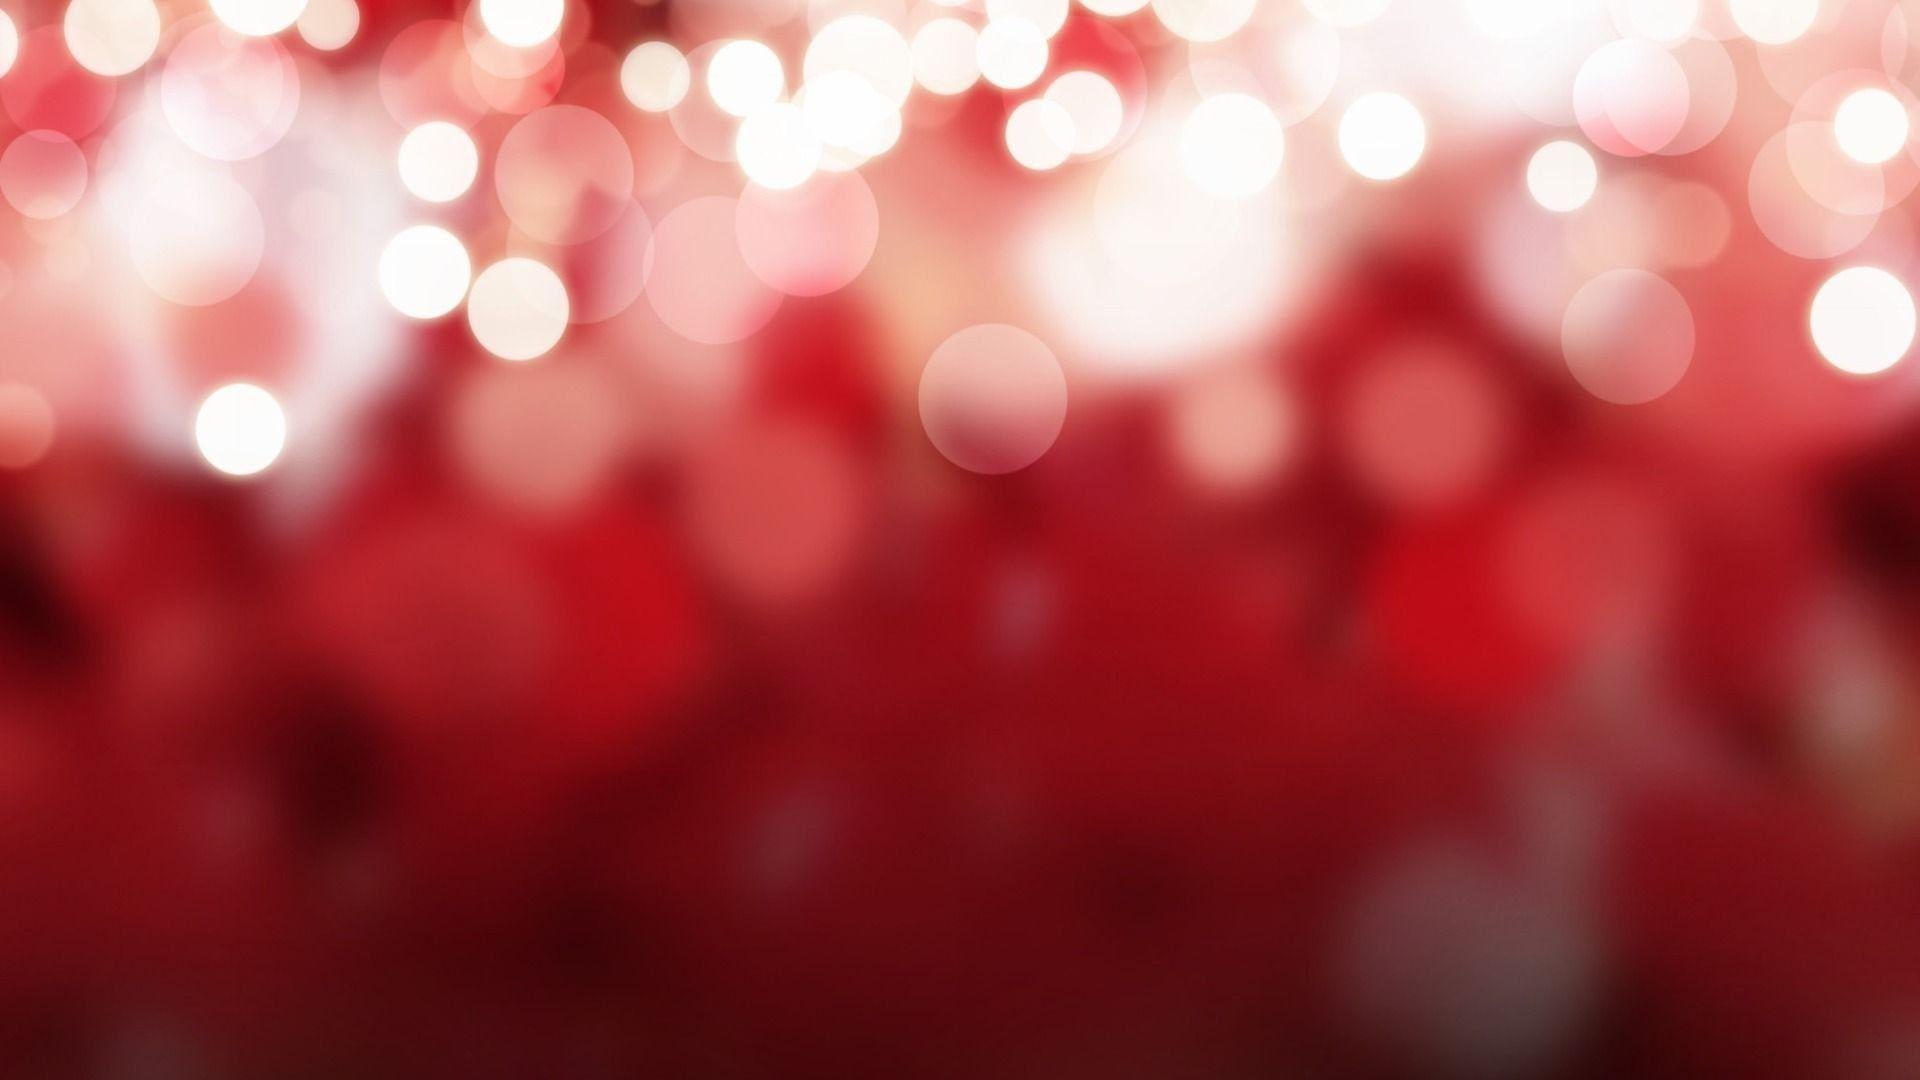 Abstract Red Bokeh Hd Desktop Wallpaper Instagram Photo